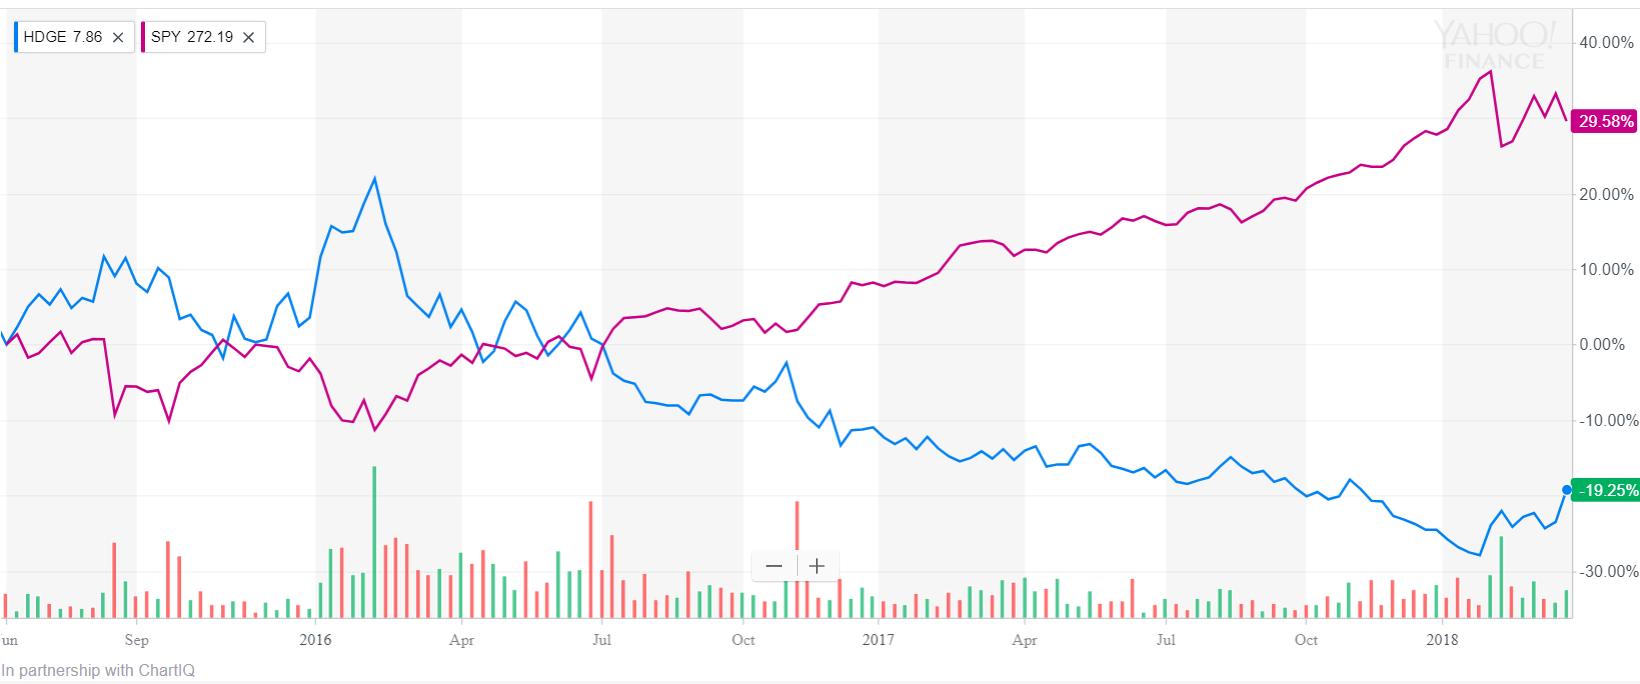 Graph of HDGE vs. SPY